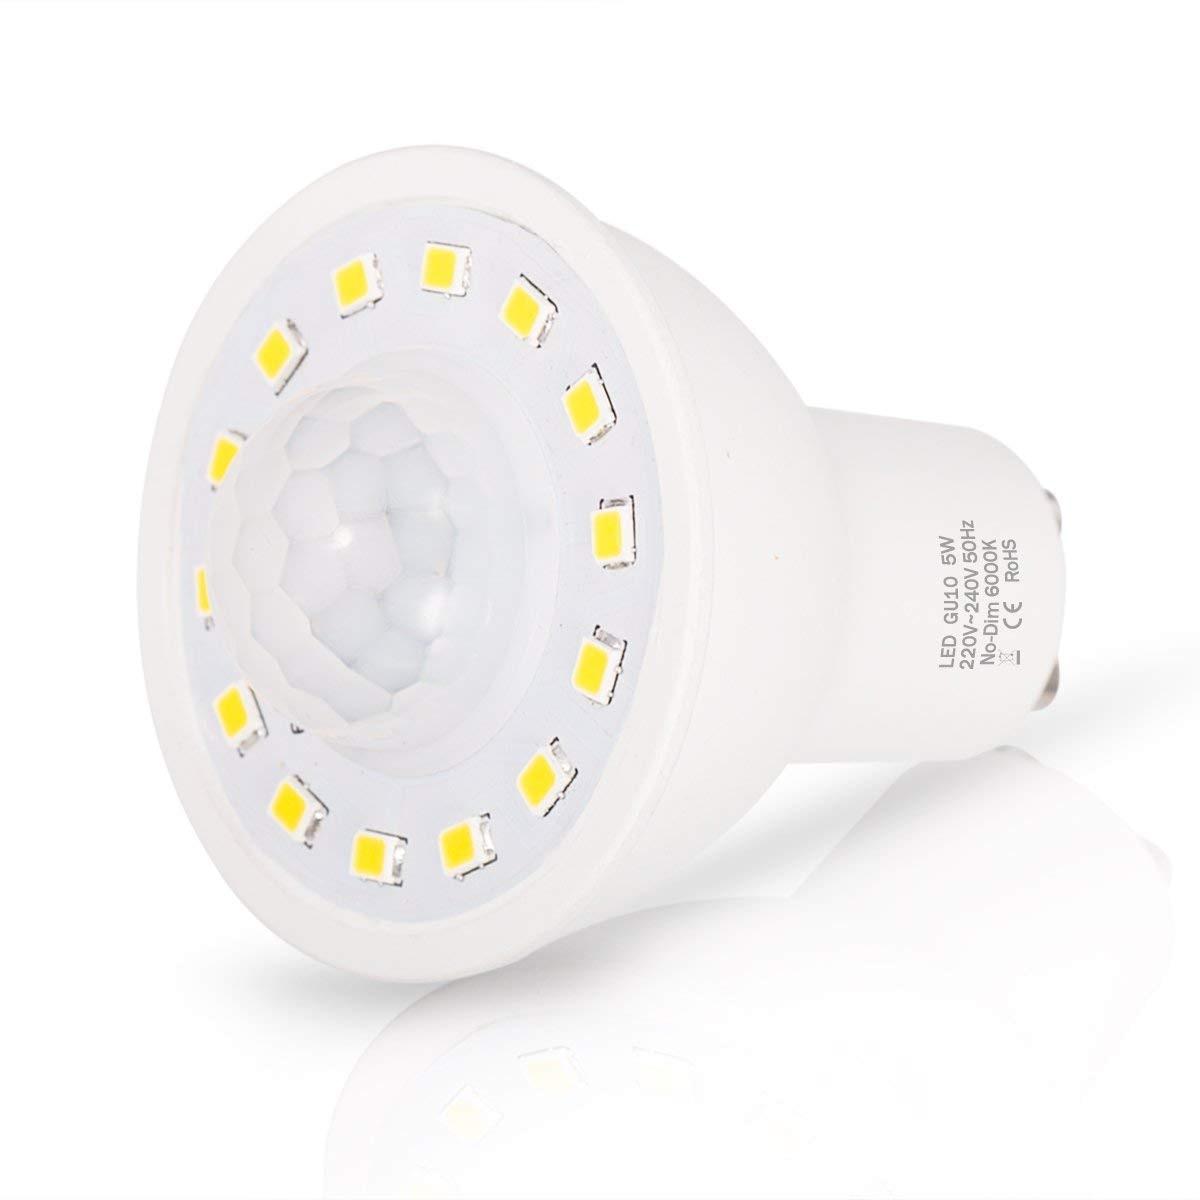 Image 2 - GU10 PIR Motion Sensor LED Light Bulbs 5W,50W Equivalent 500lm Day White 6000K for Stairs Garage Corridor Walkway Hallway 2Pack-in LED Bulbs & Tubes from Lights & Lighting